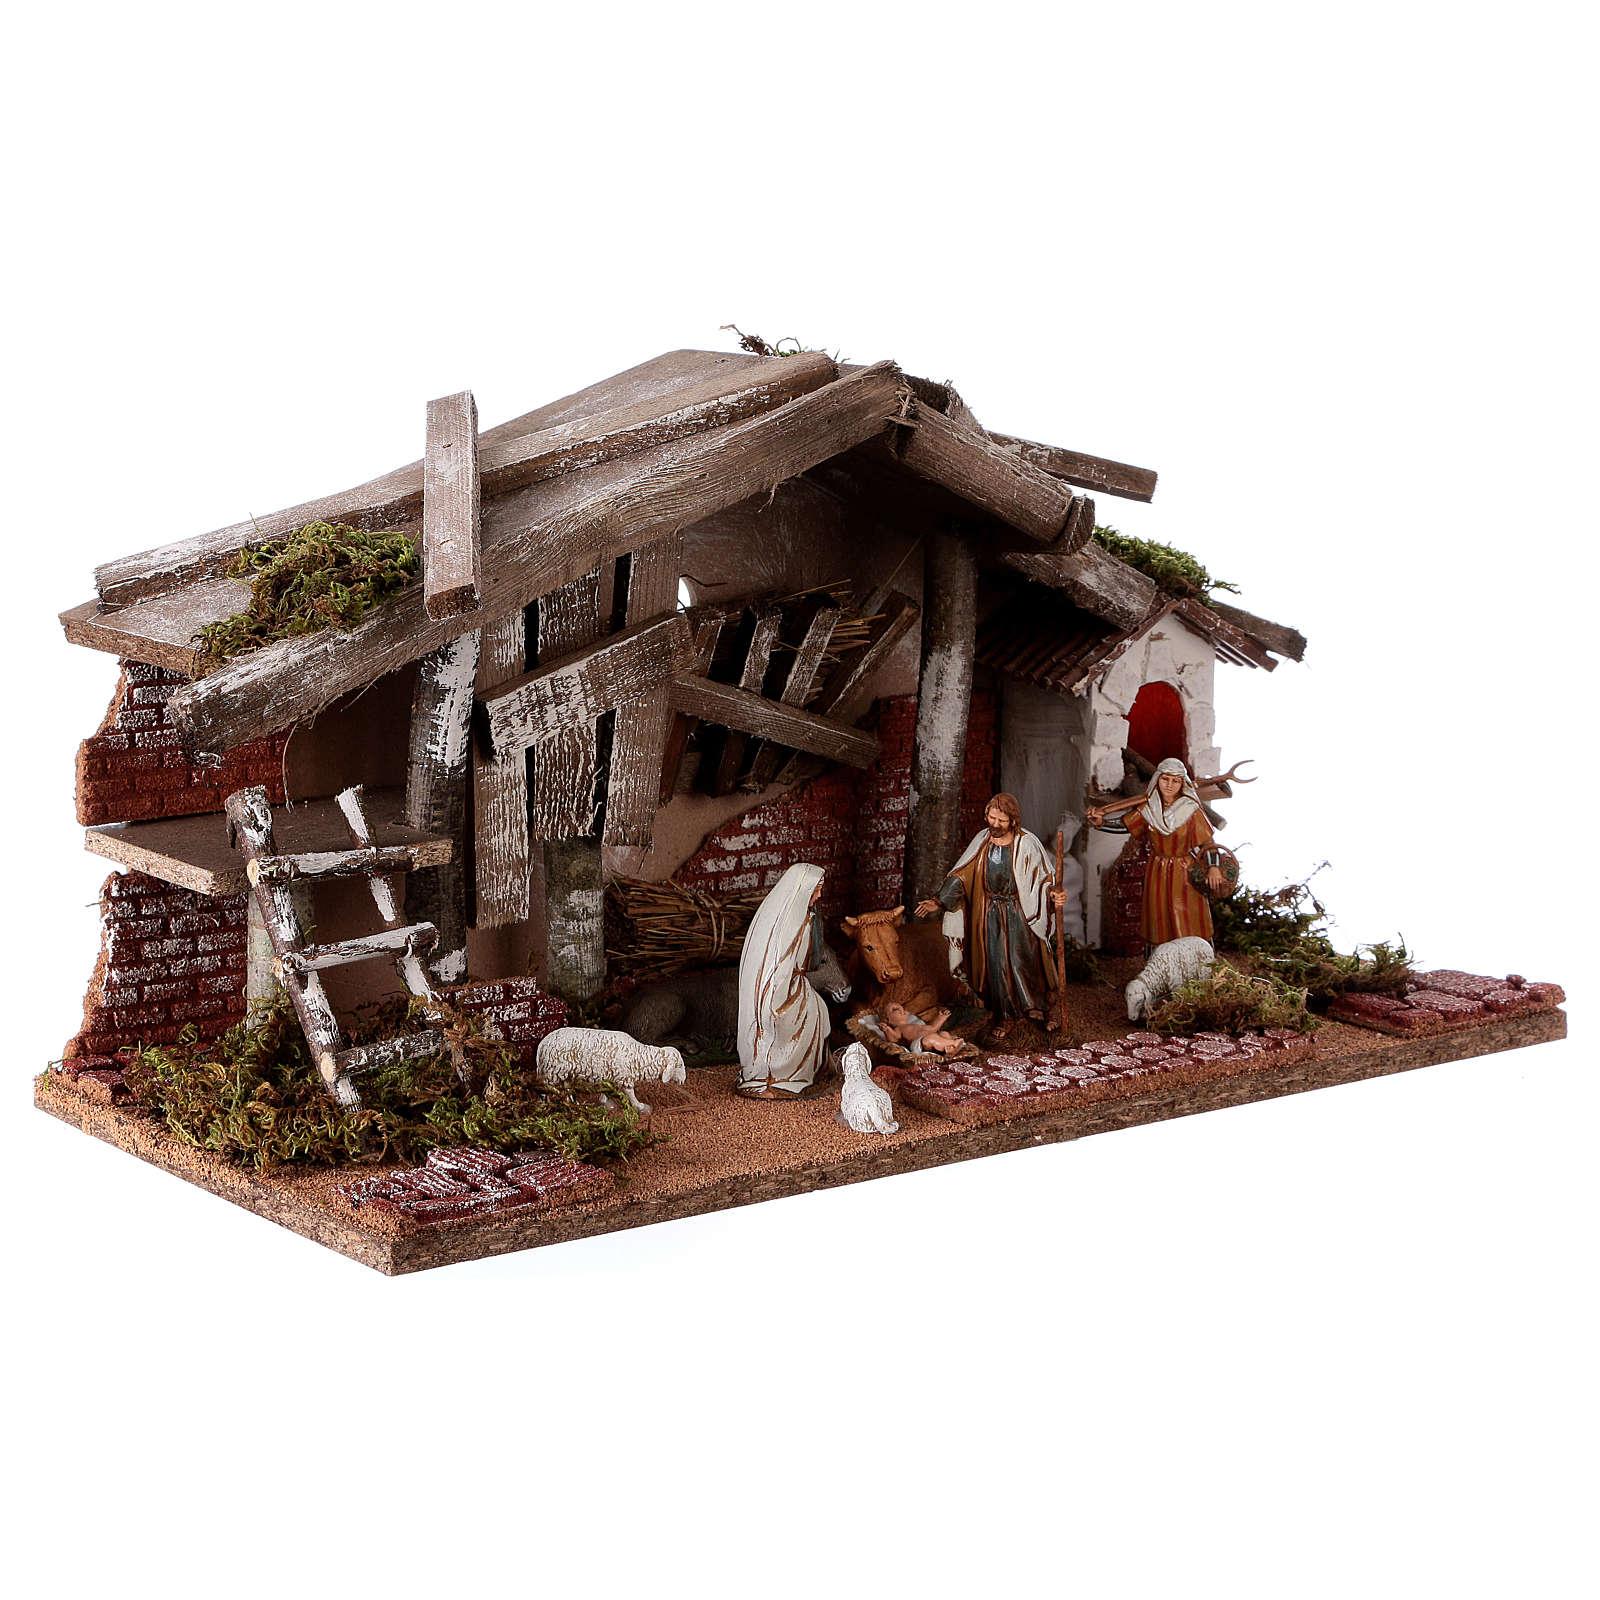 Barn with 10 cm Nativity scene and shepherd 25x50x25 cm 4